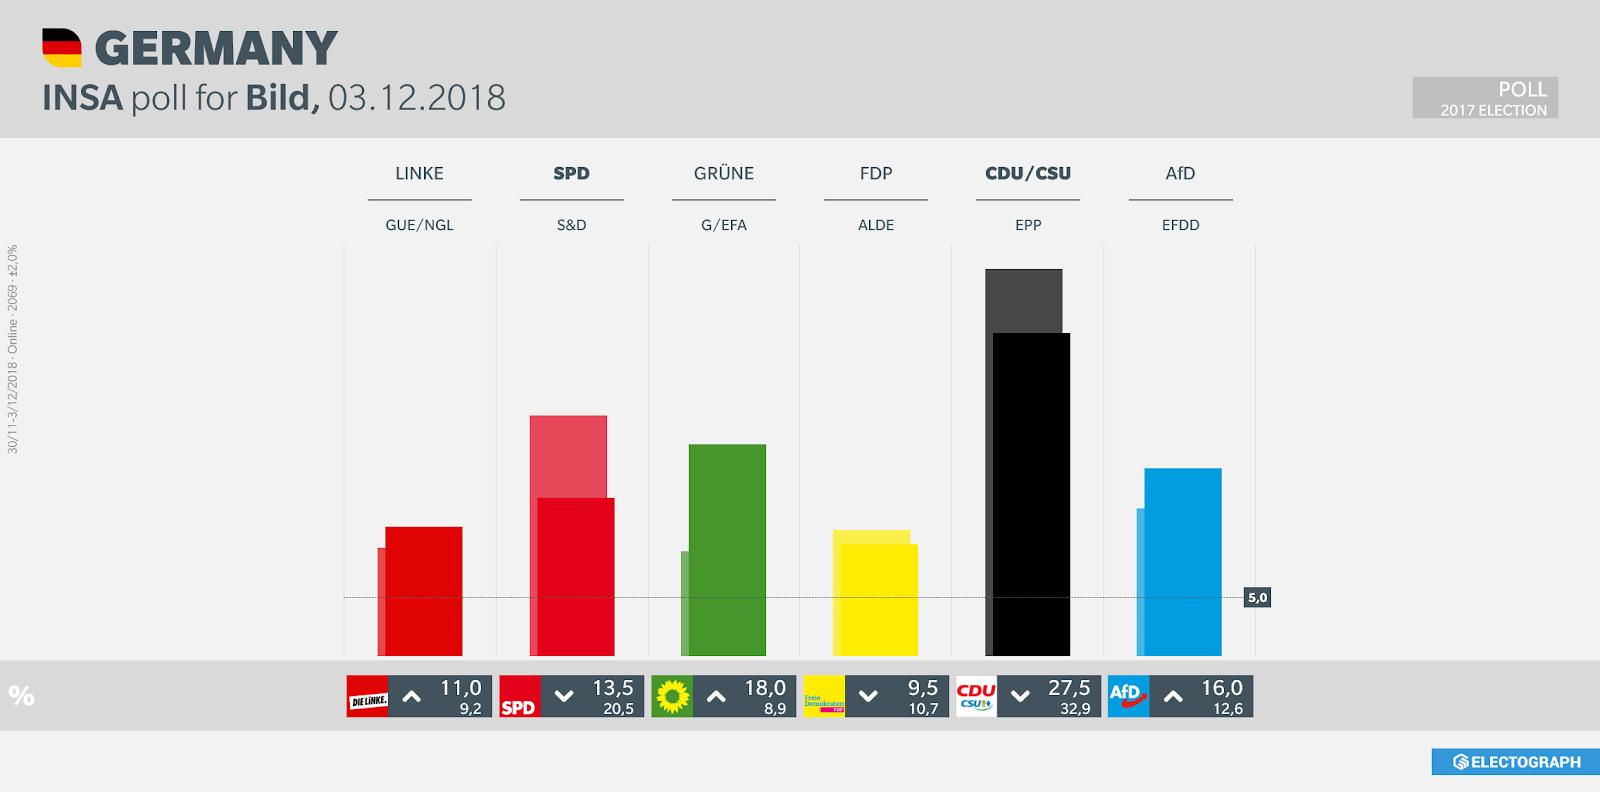 GERMANY: INSA poll chart for Bild, 3 December 2018